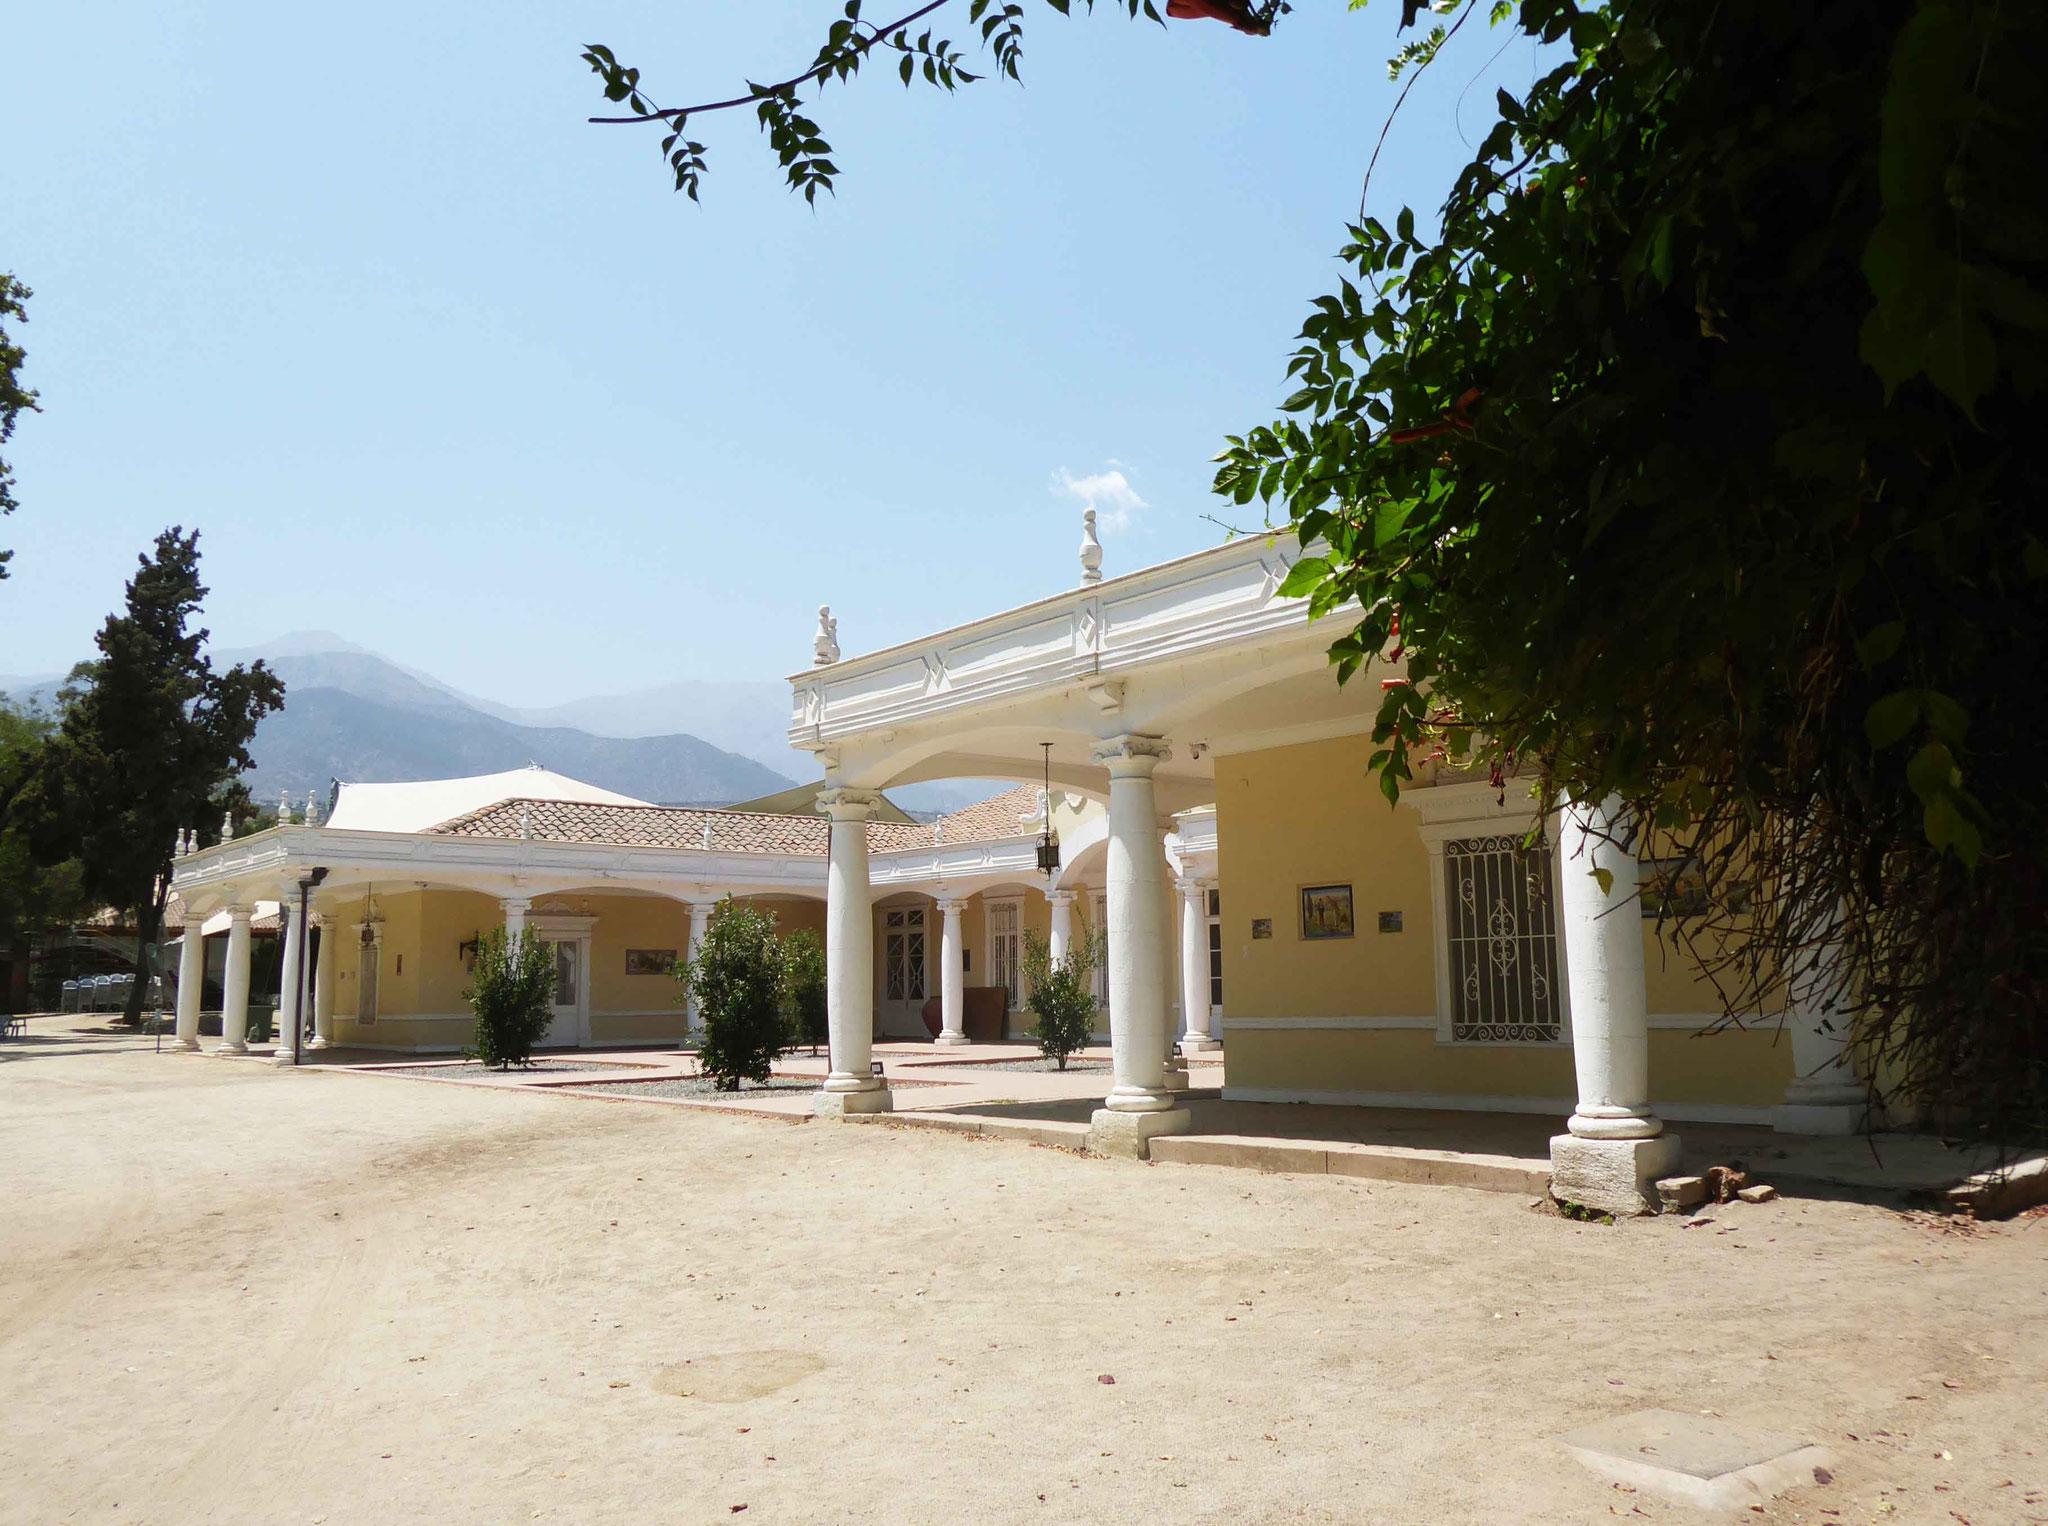 Casa Santa Rosa de Apoquindo, musée et centre culturel de Las Condes